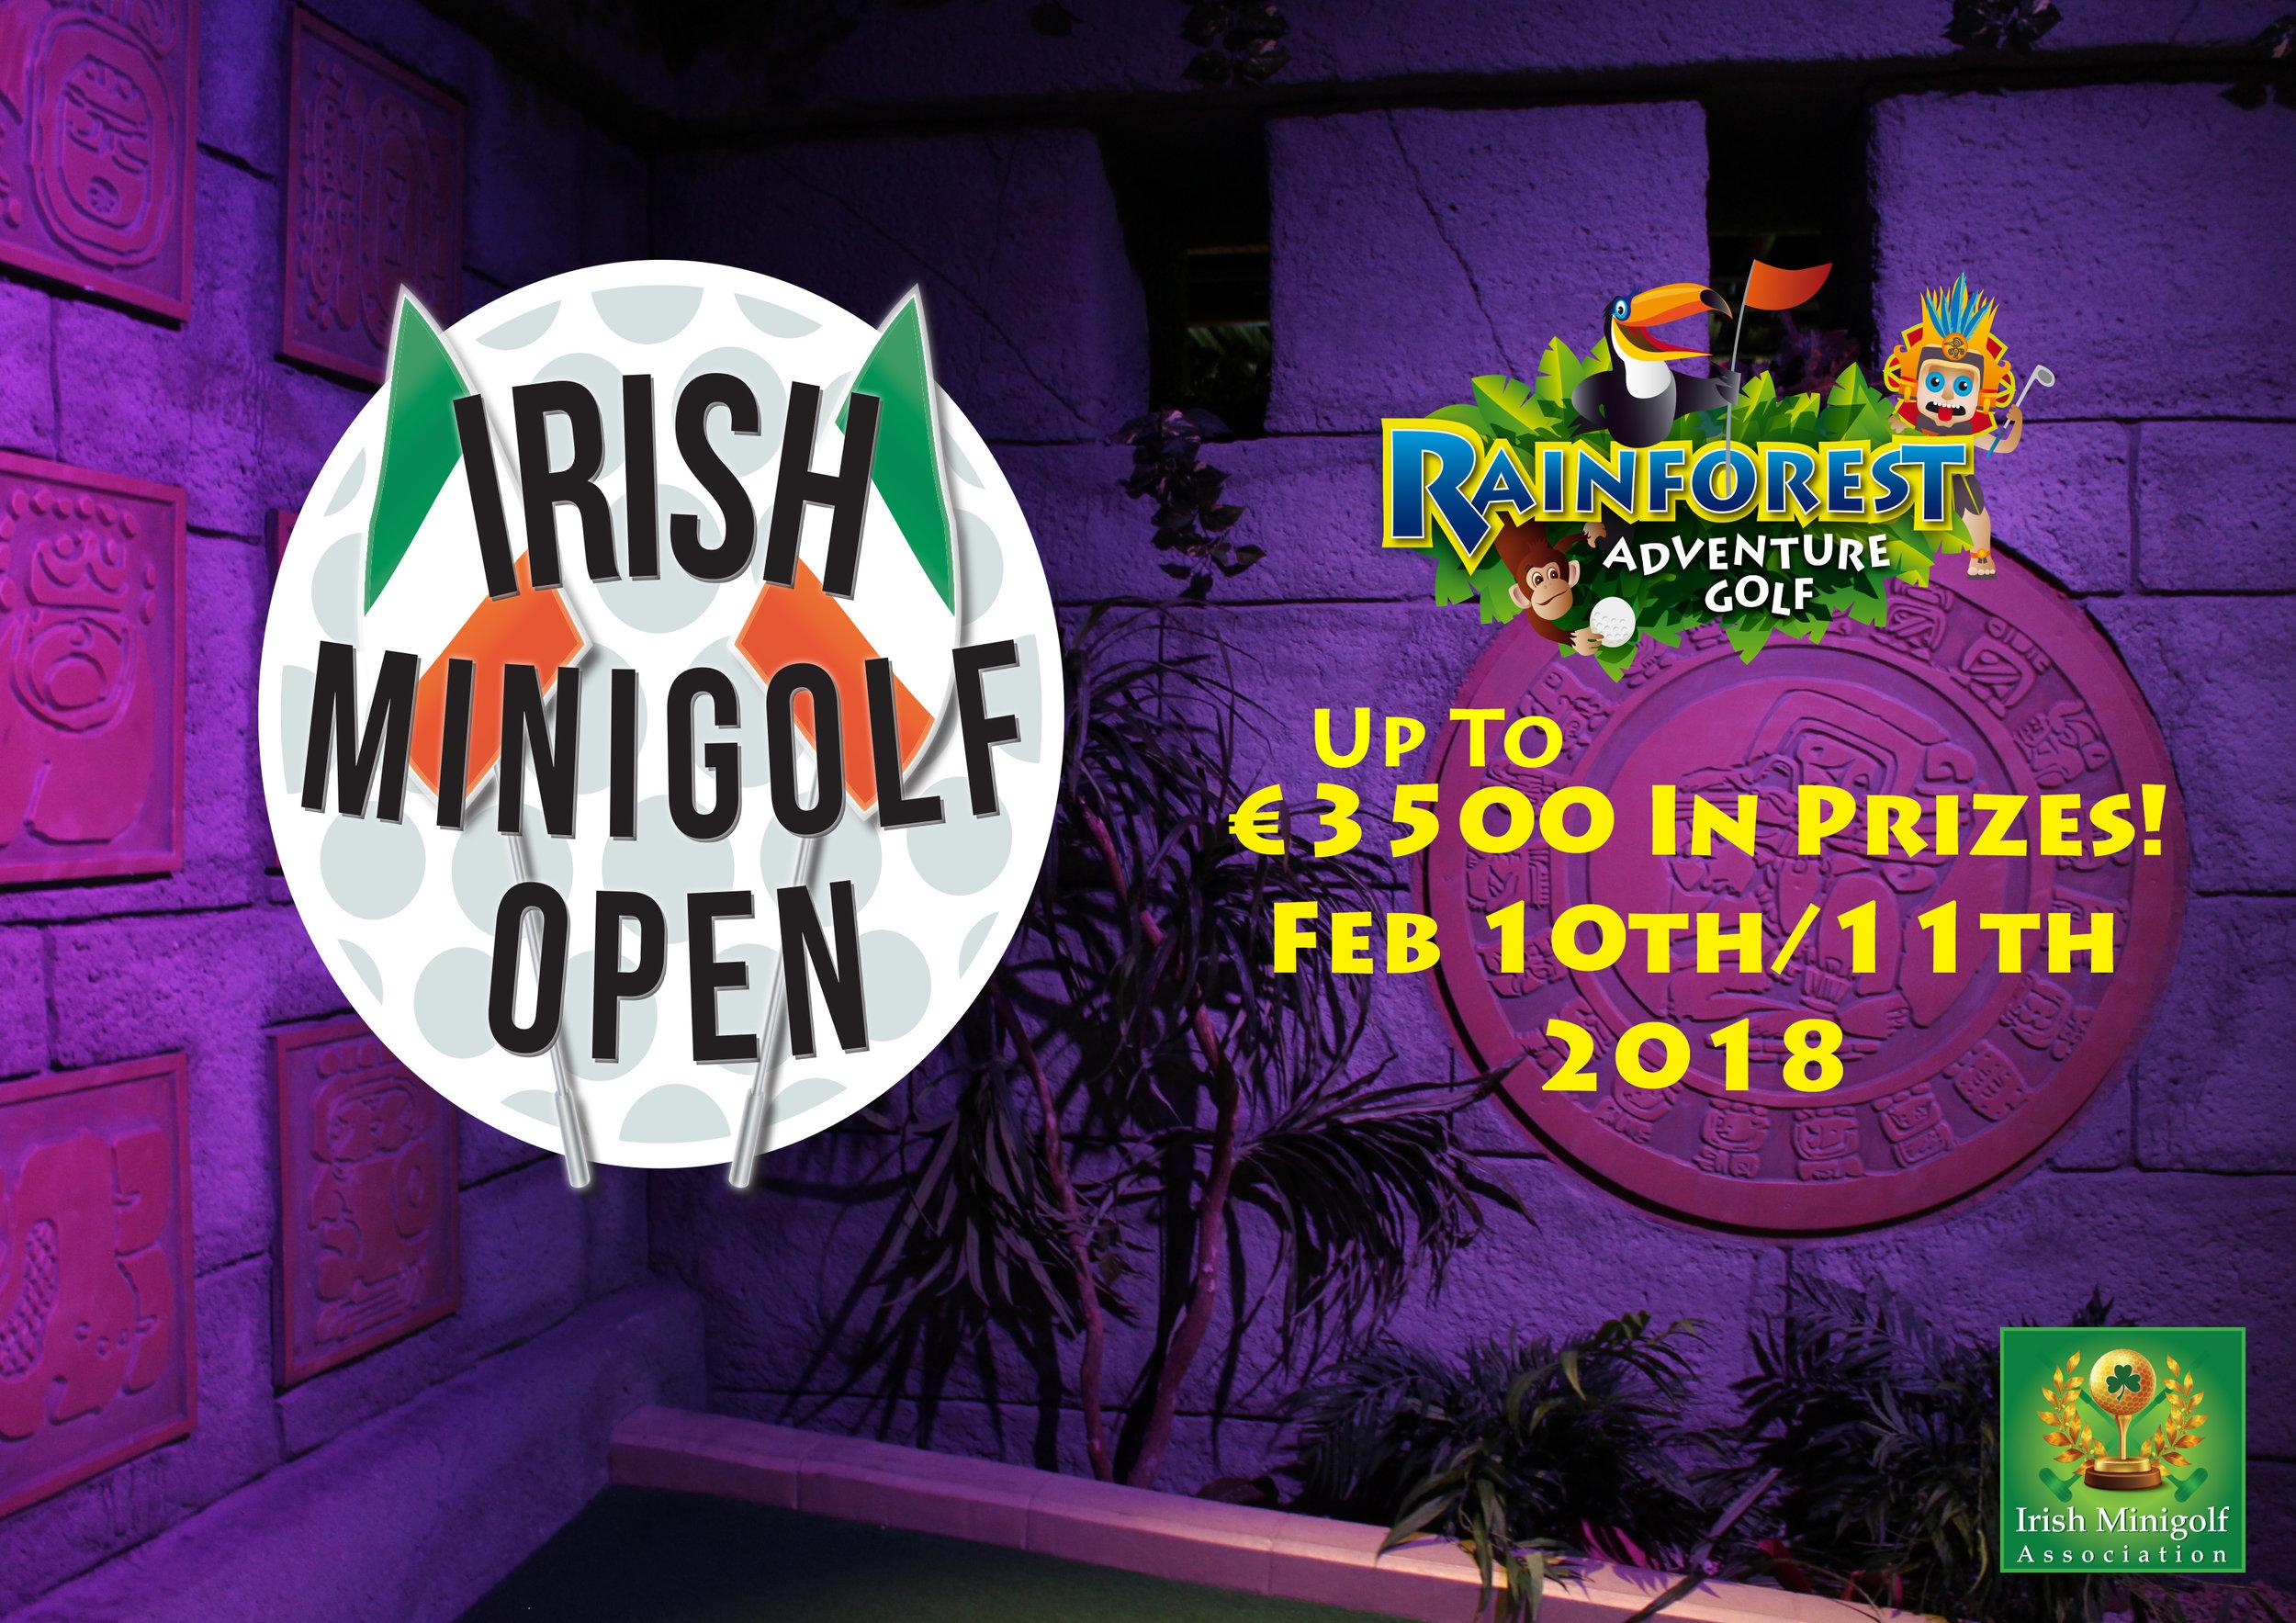 Irish Minigolf Open 2018 landscape promo.jpg